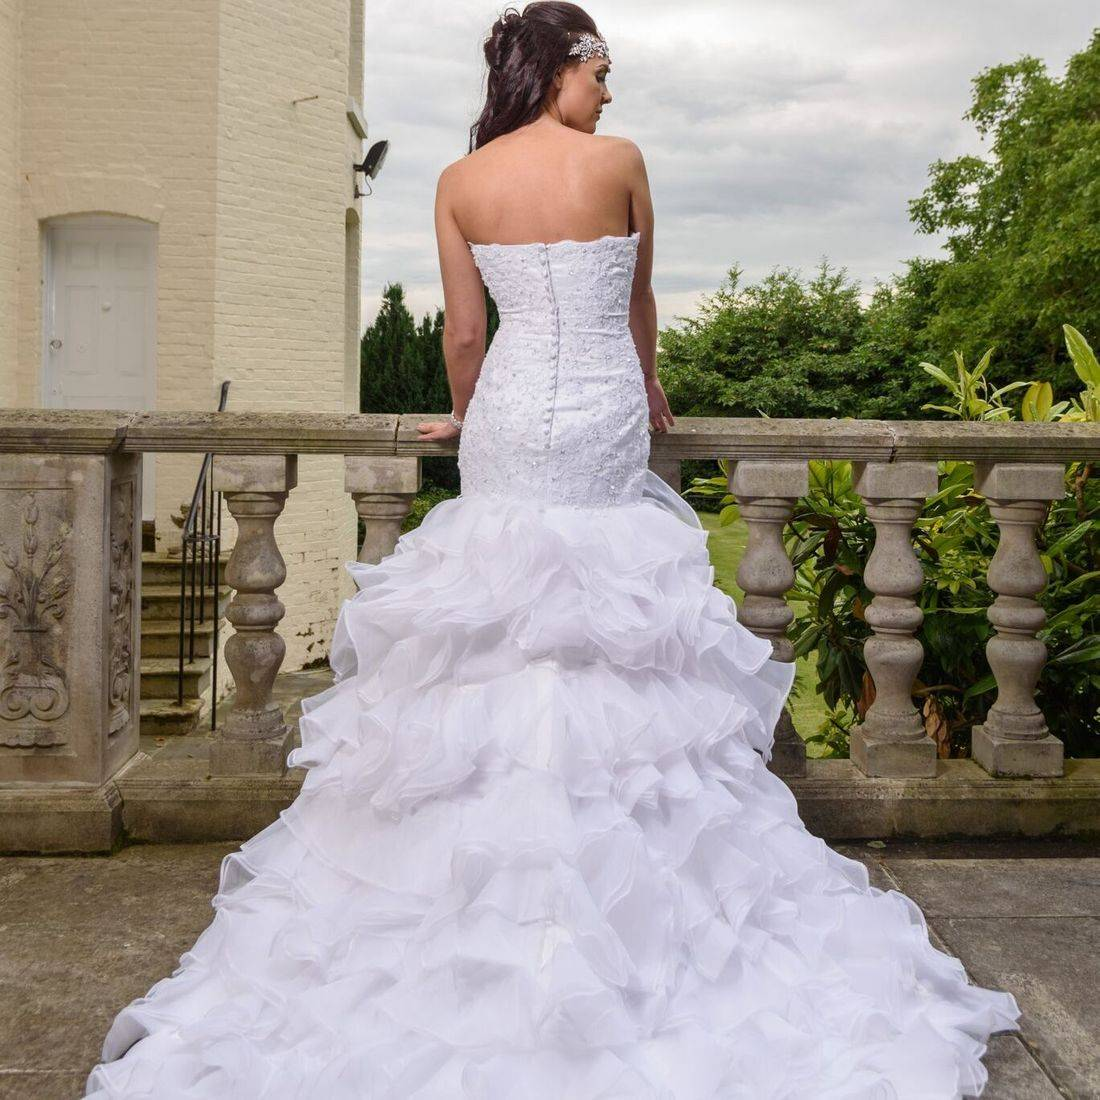 ruffled skirt wedding dress, ruffle wedding dress, elongated bodice wedding dress, sparkly wedding dress, sweatheart neckline